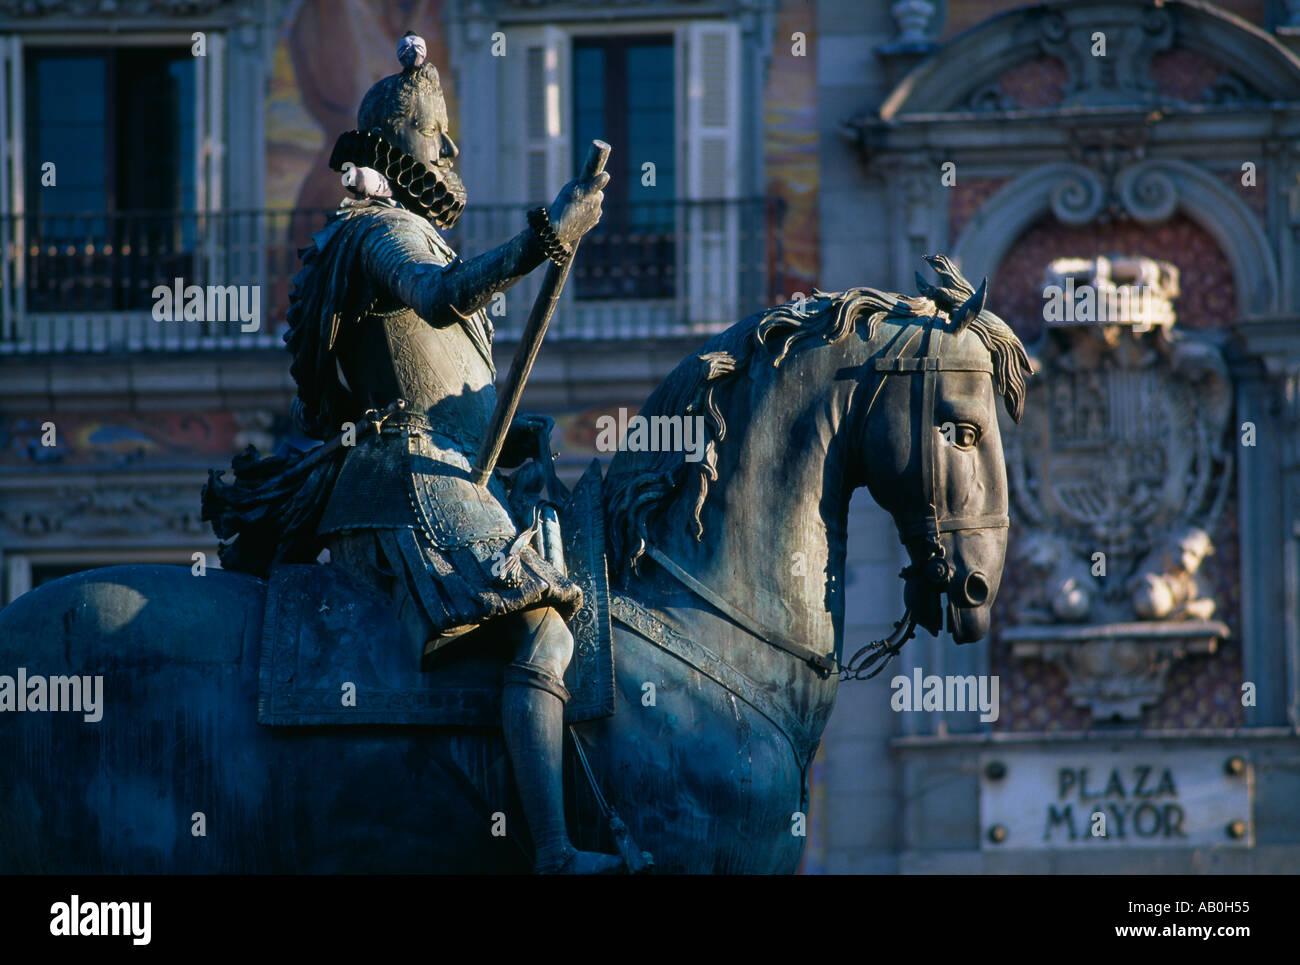 Phillip III Statue Plaza Mayor Madrid Spain - Stock Image